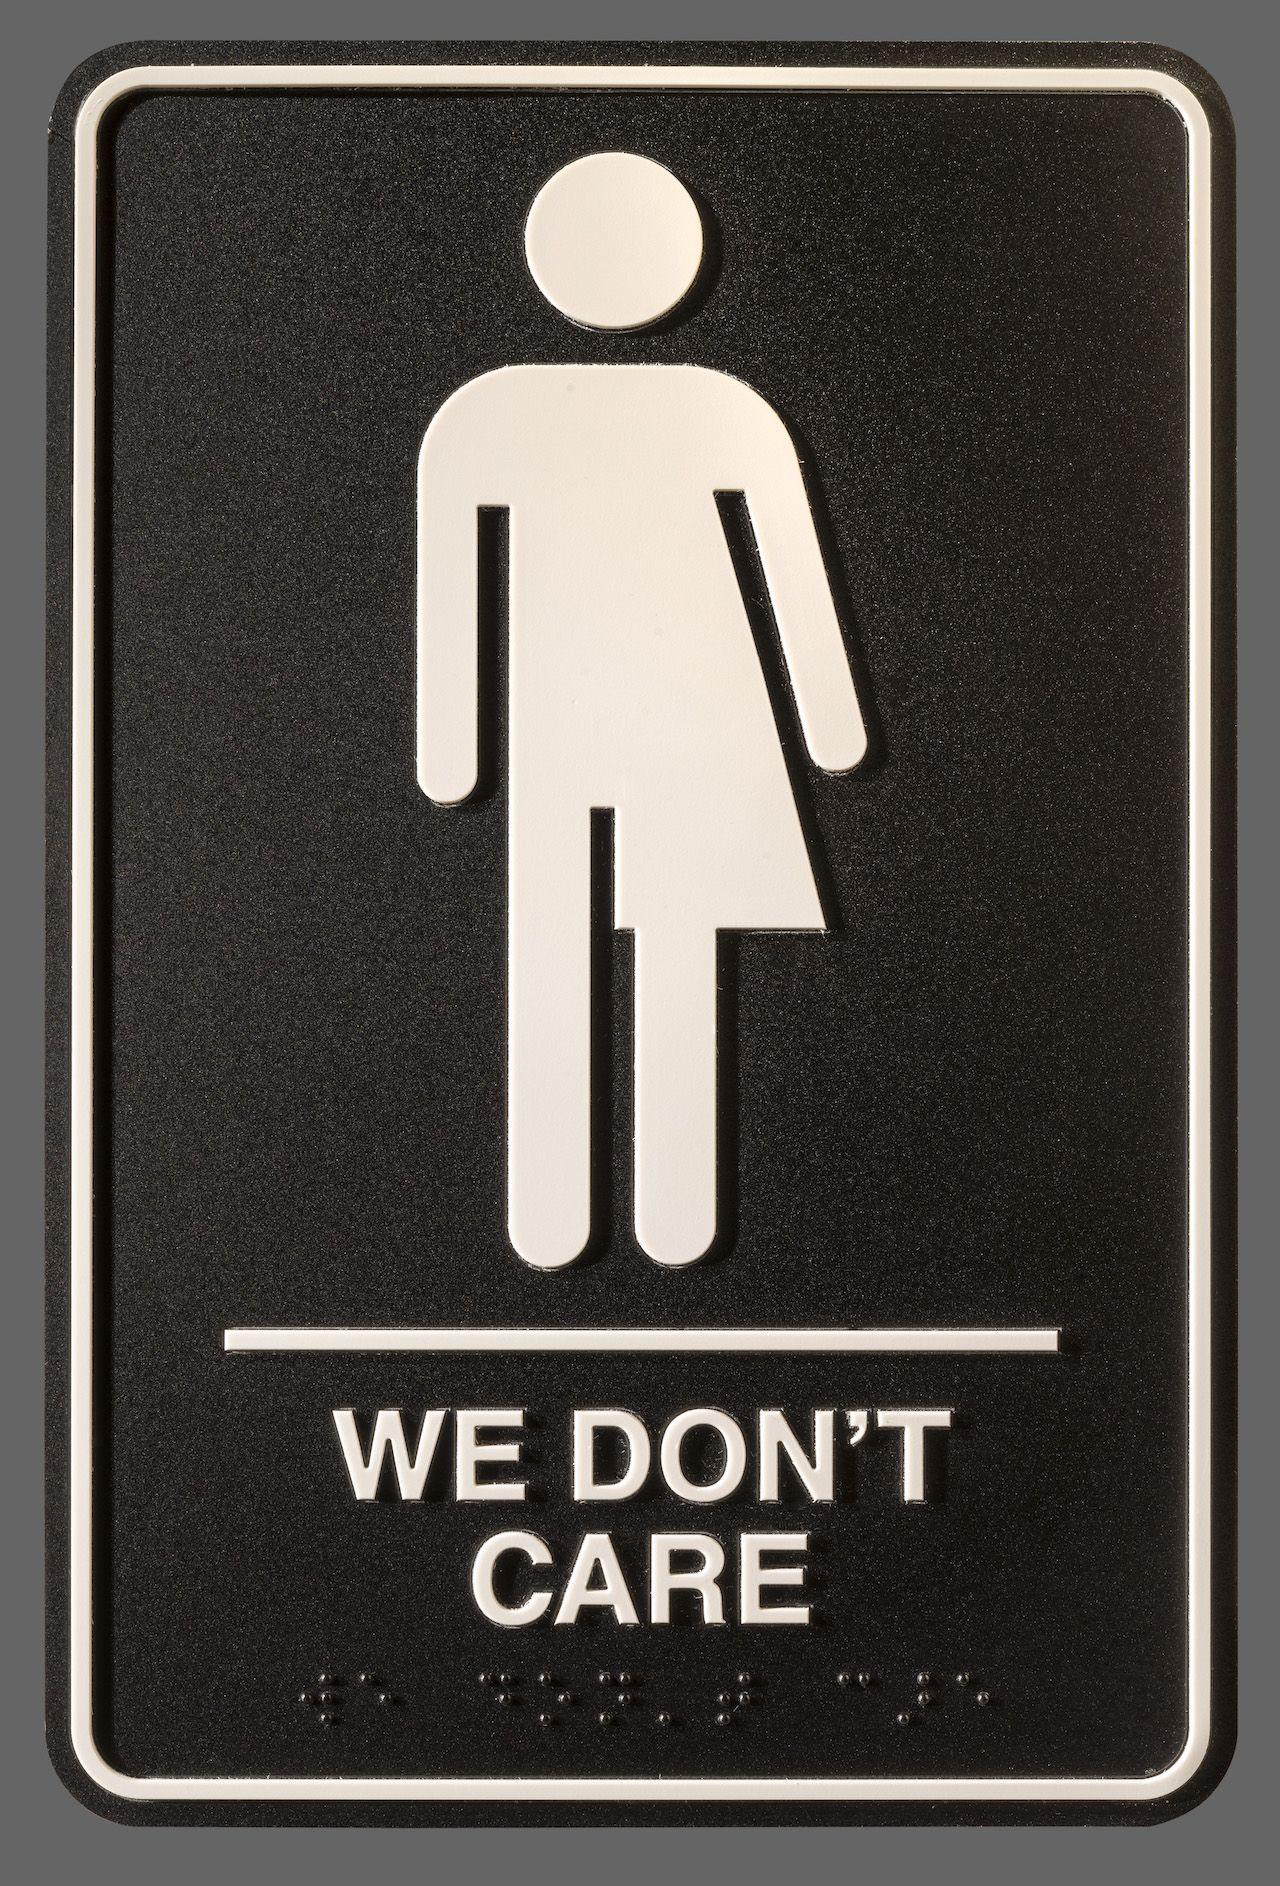 We Dont Care Courtesy Peregrine Honig Slade First Floor - All gender bathroom sign for bathroom decor ideas